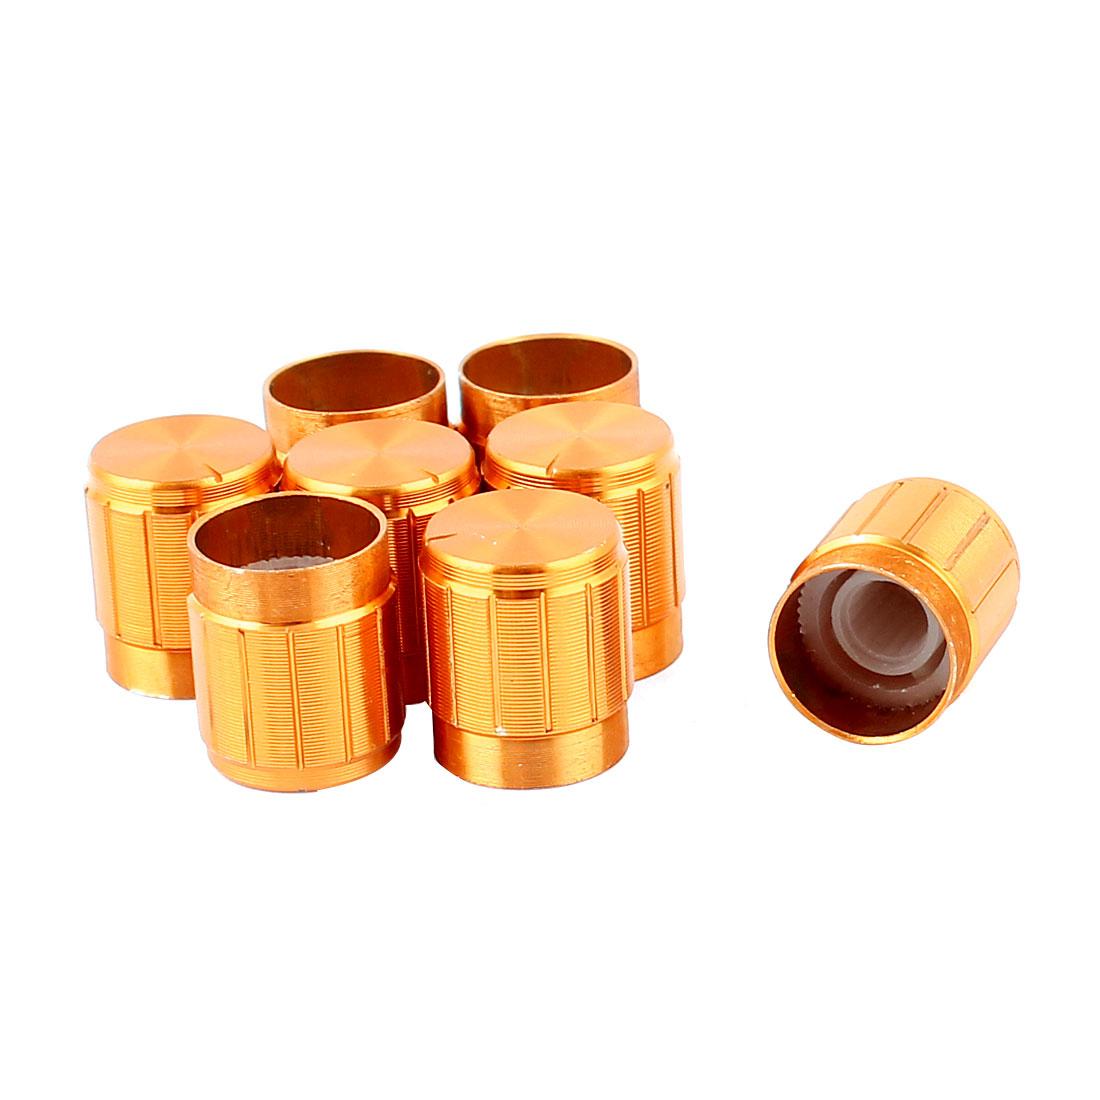 8Pcs 5.5mm Shaft 15mm Dia Adjustable Turn Potentiometer Rotary Control Knobs